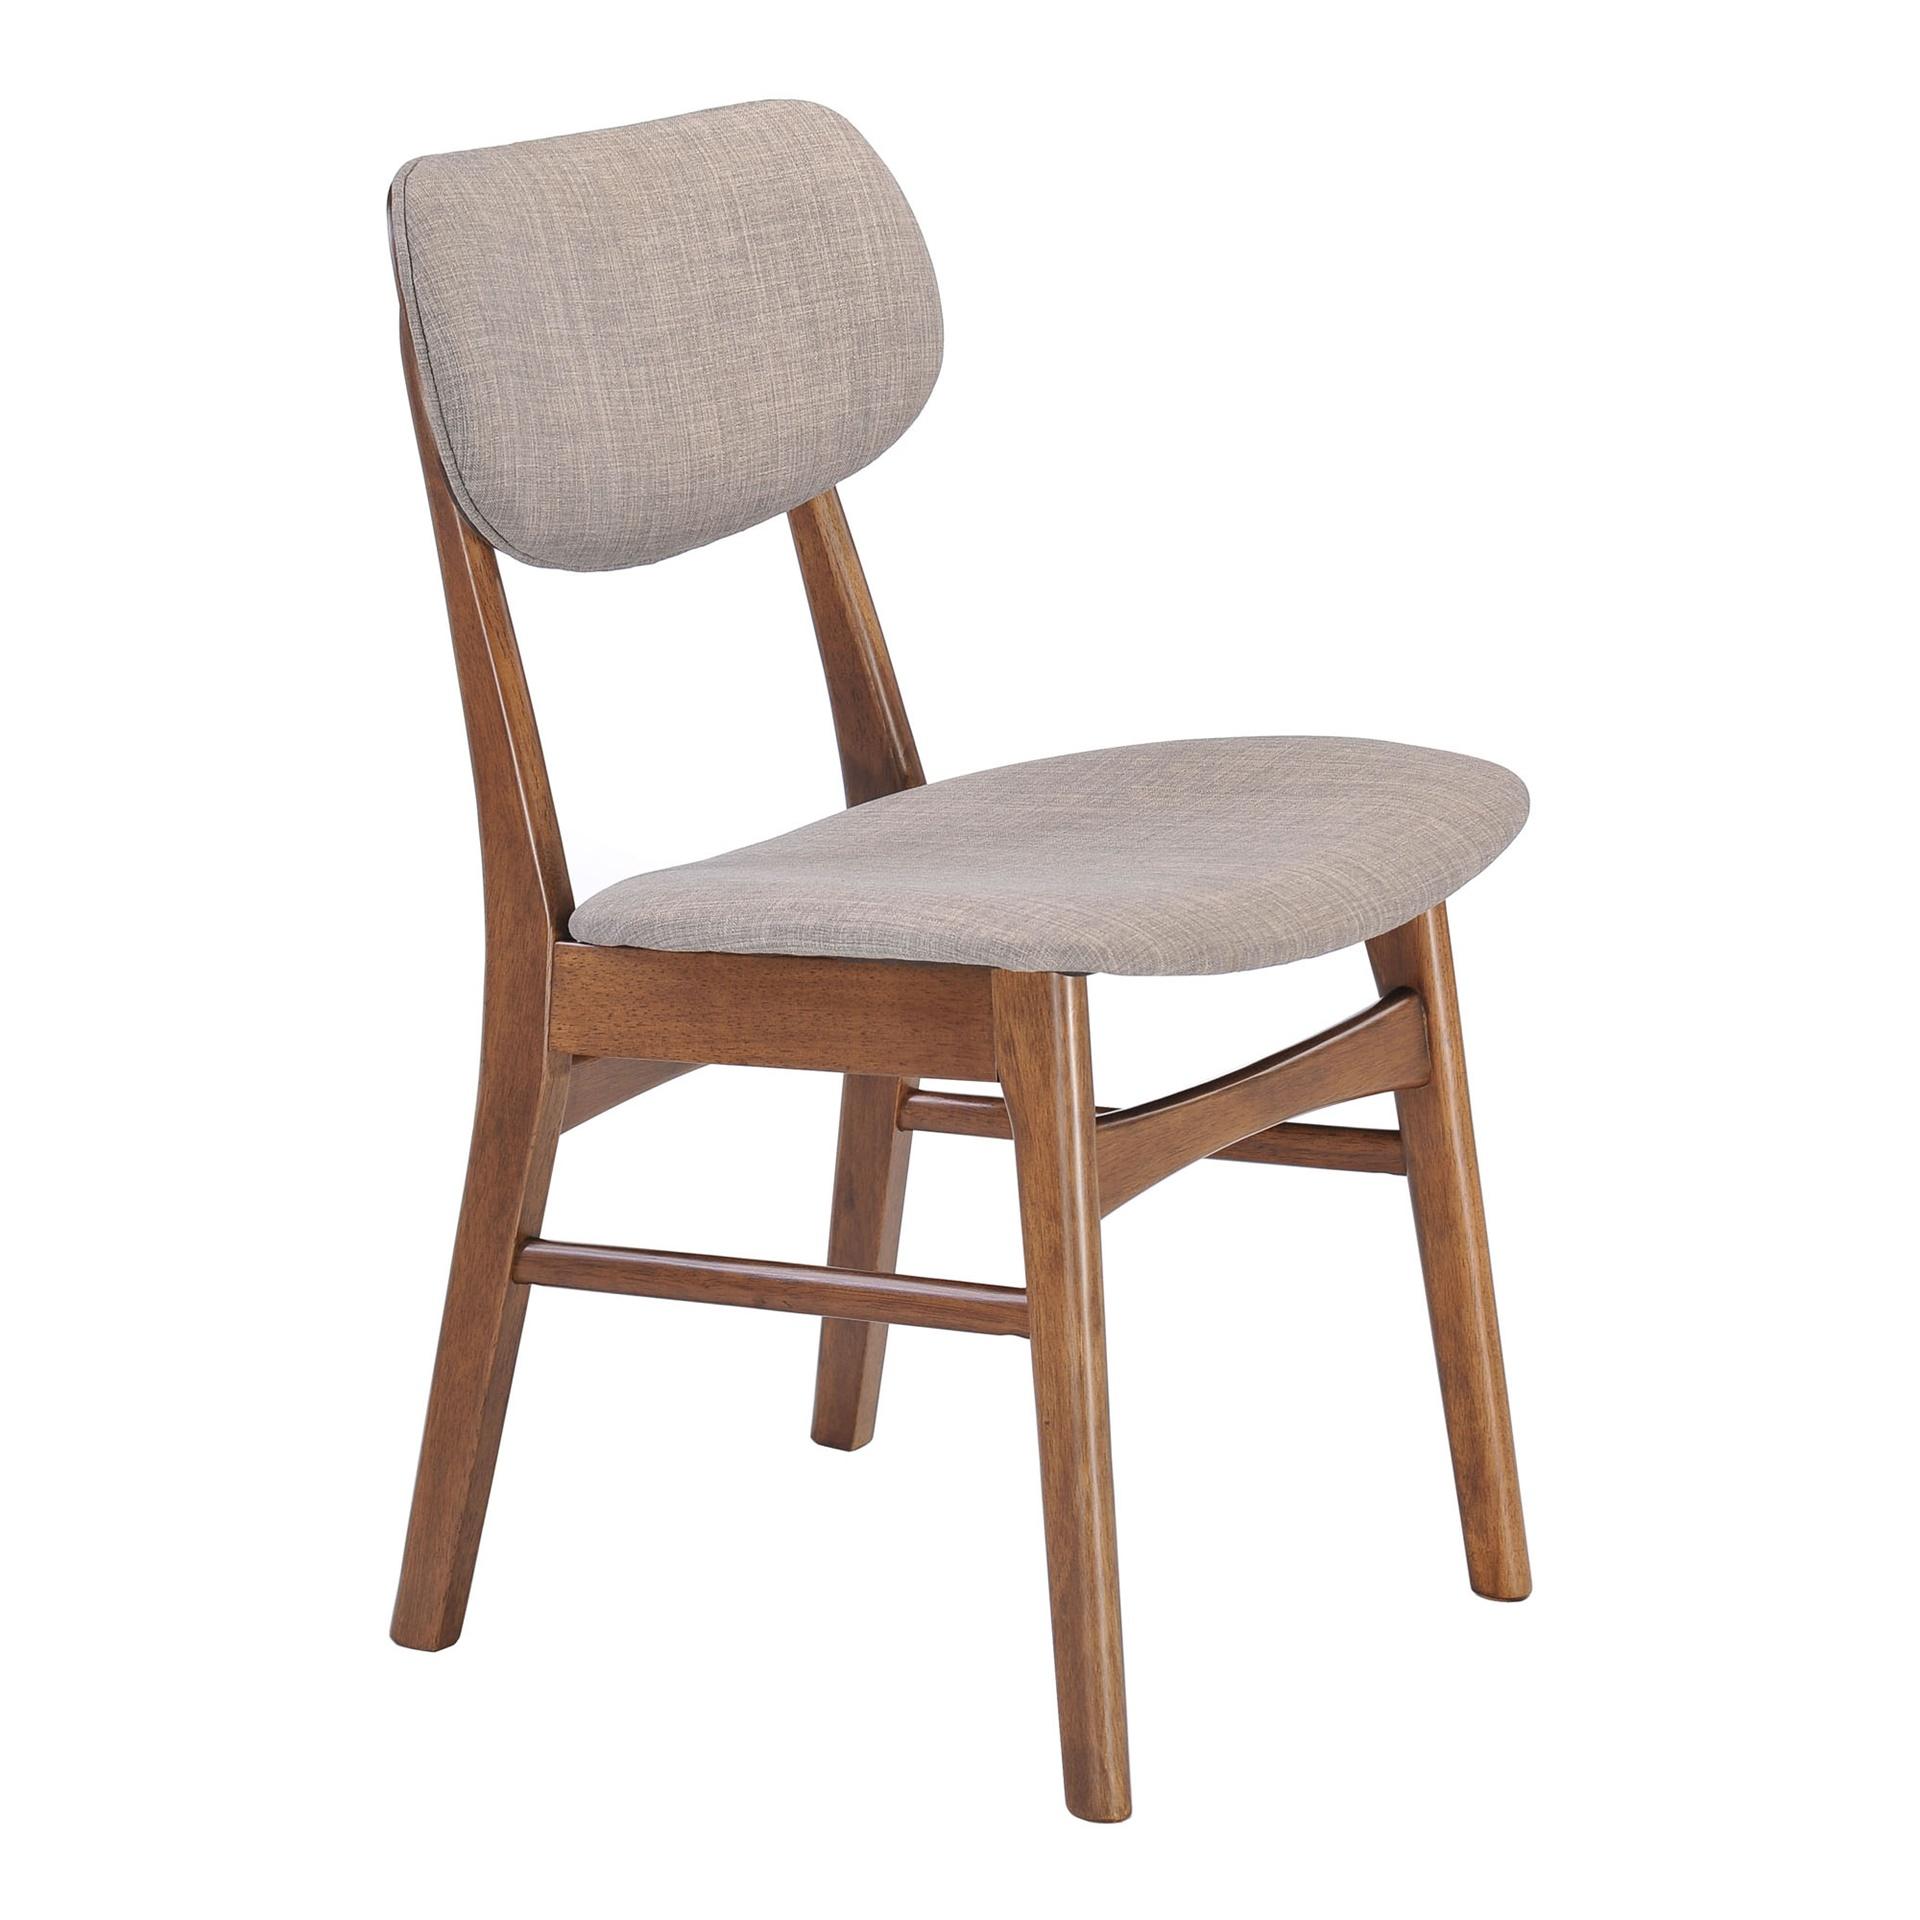 Pleasant Midtown Dining Chair Dailytribune Chair Design For Home Dailytribuneorg